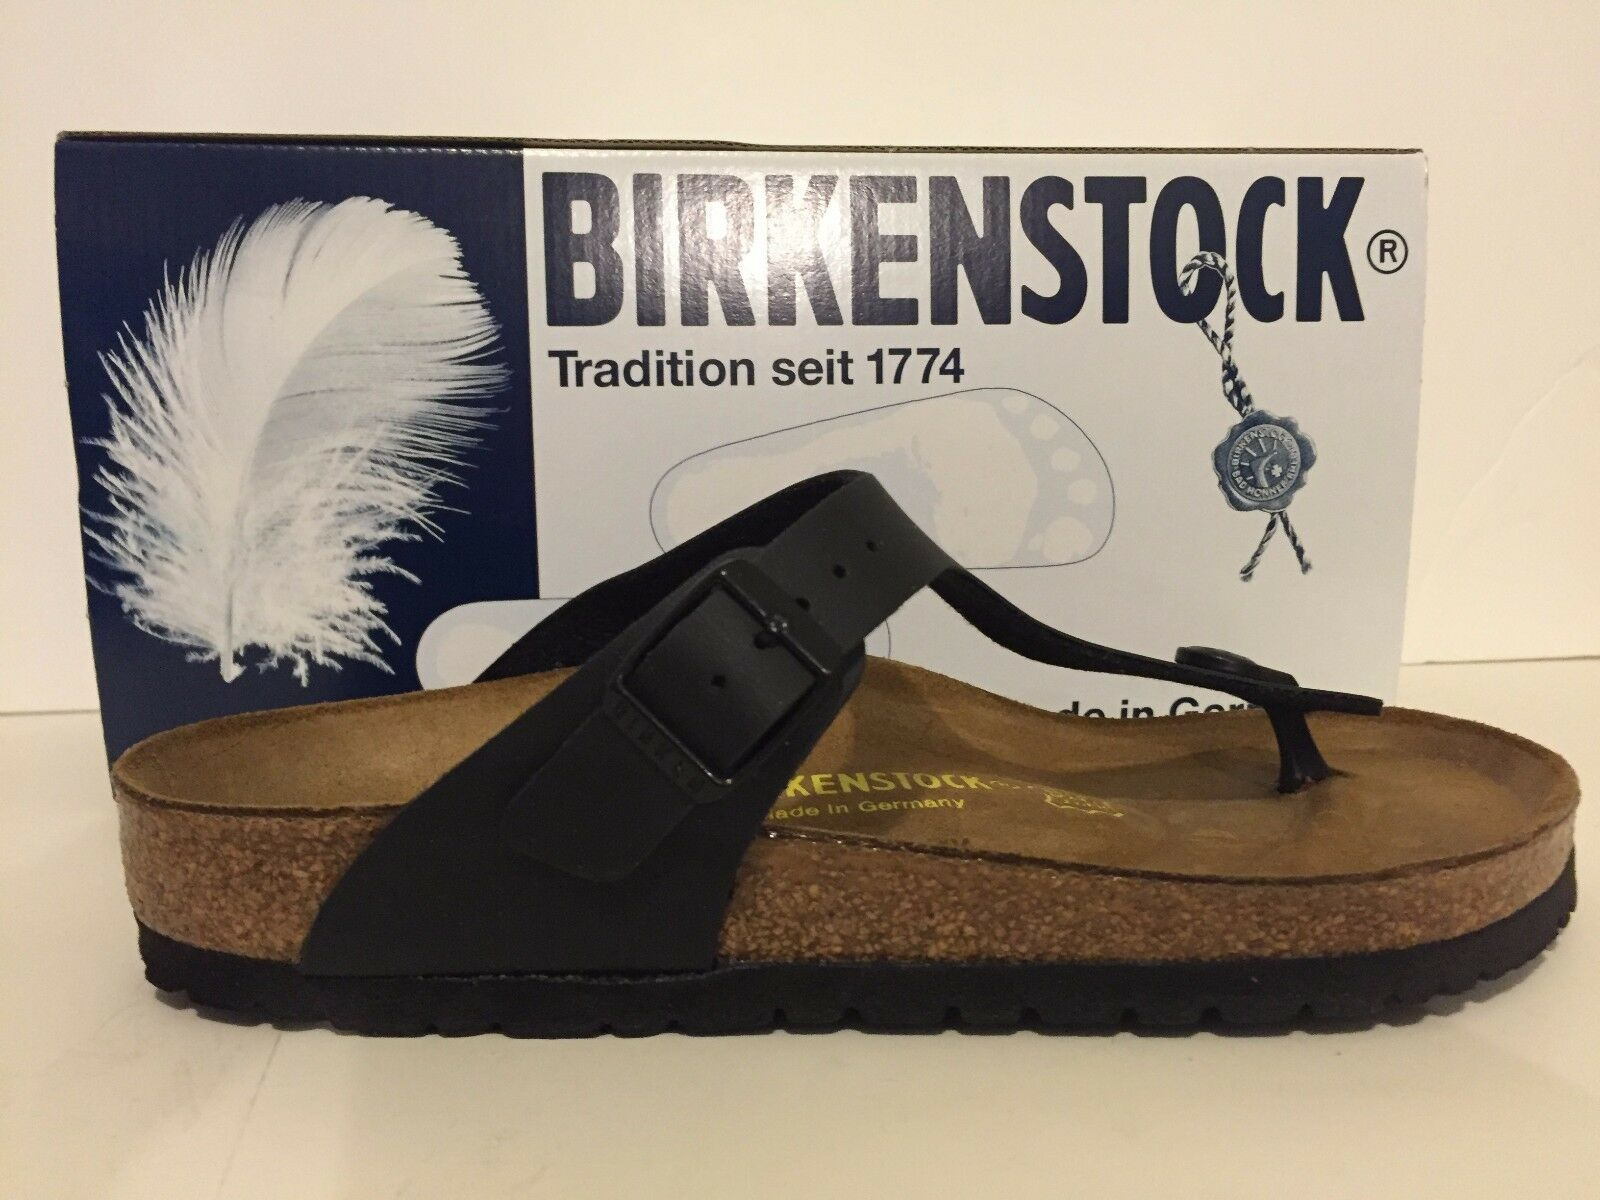 6344174d0da Birkenstock Women s Gizeh 043691 Size 40 Black Leather Slip on Slide Sandal  Sz 9 for sale online